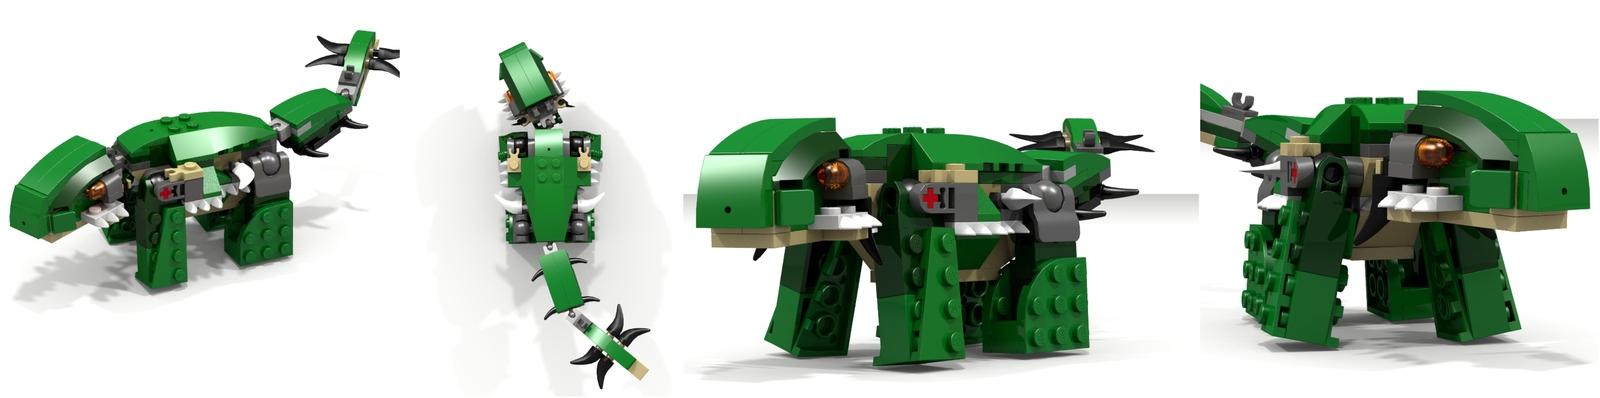 Lego Ideas Blog Meet The Ideas Test Lab Fourth Build Challenge